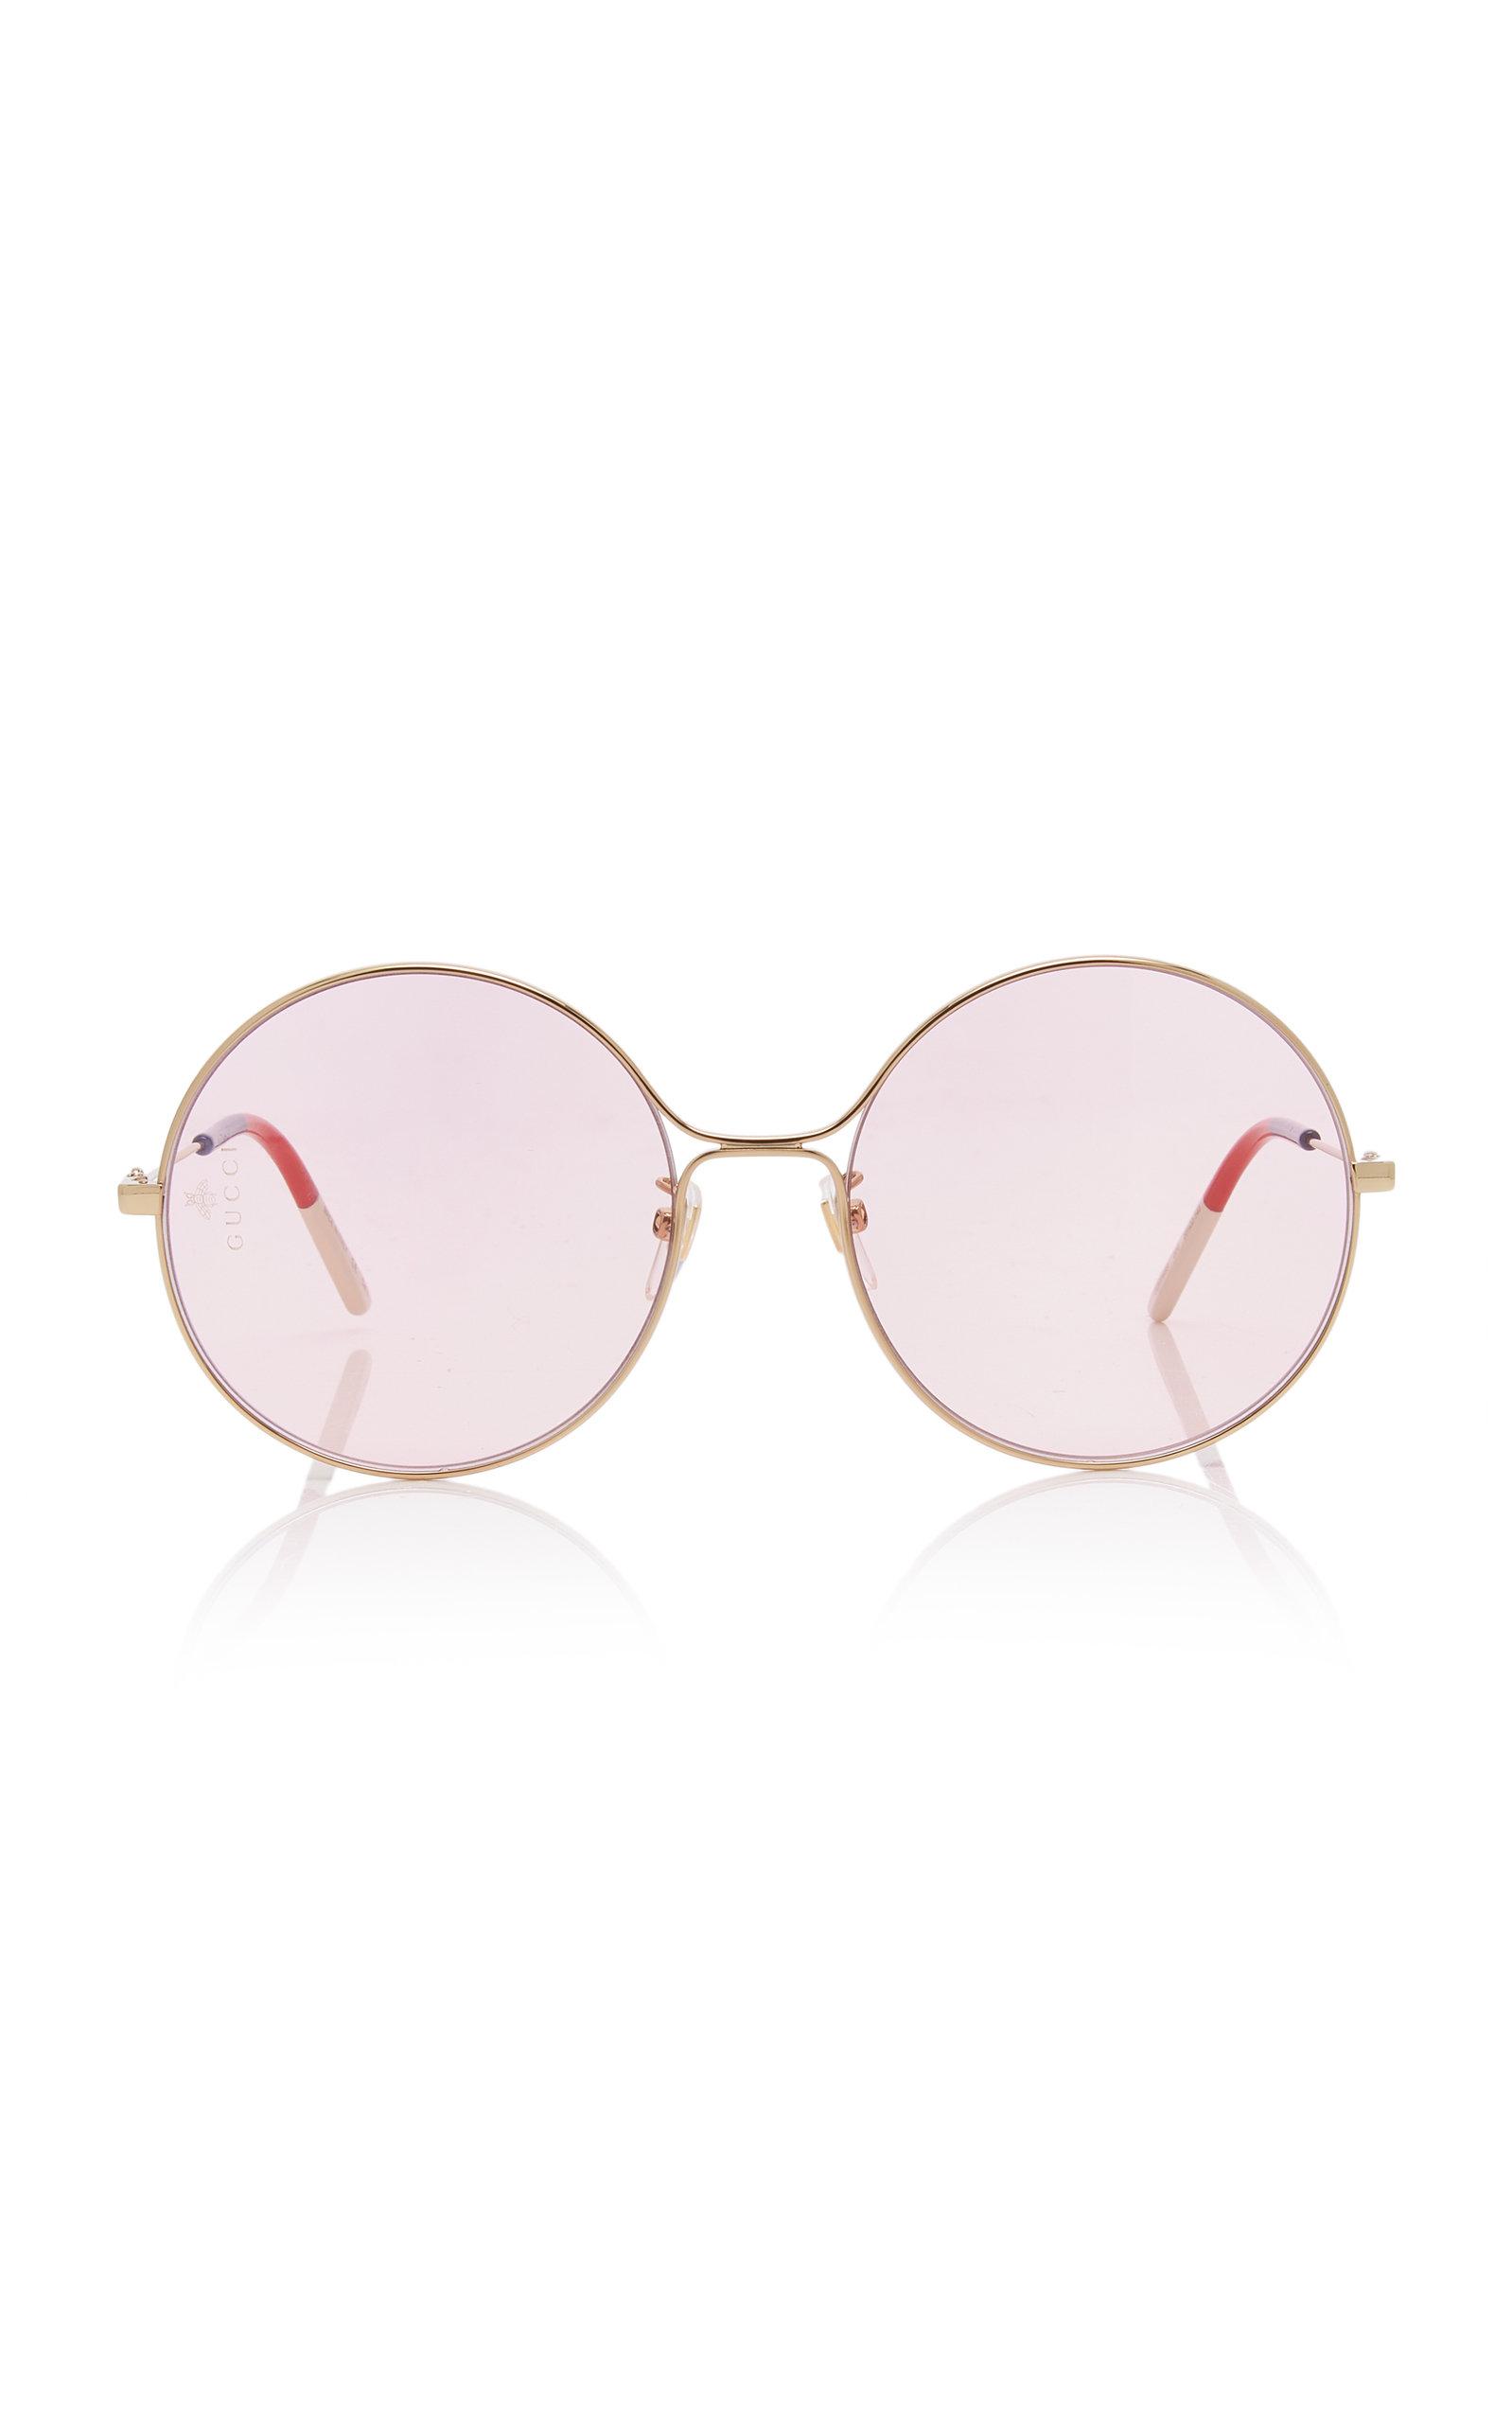 35f51357c Gucci SunglassesGlasant Oversized Metal Round Sunglasses. CLOSE. Loading